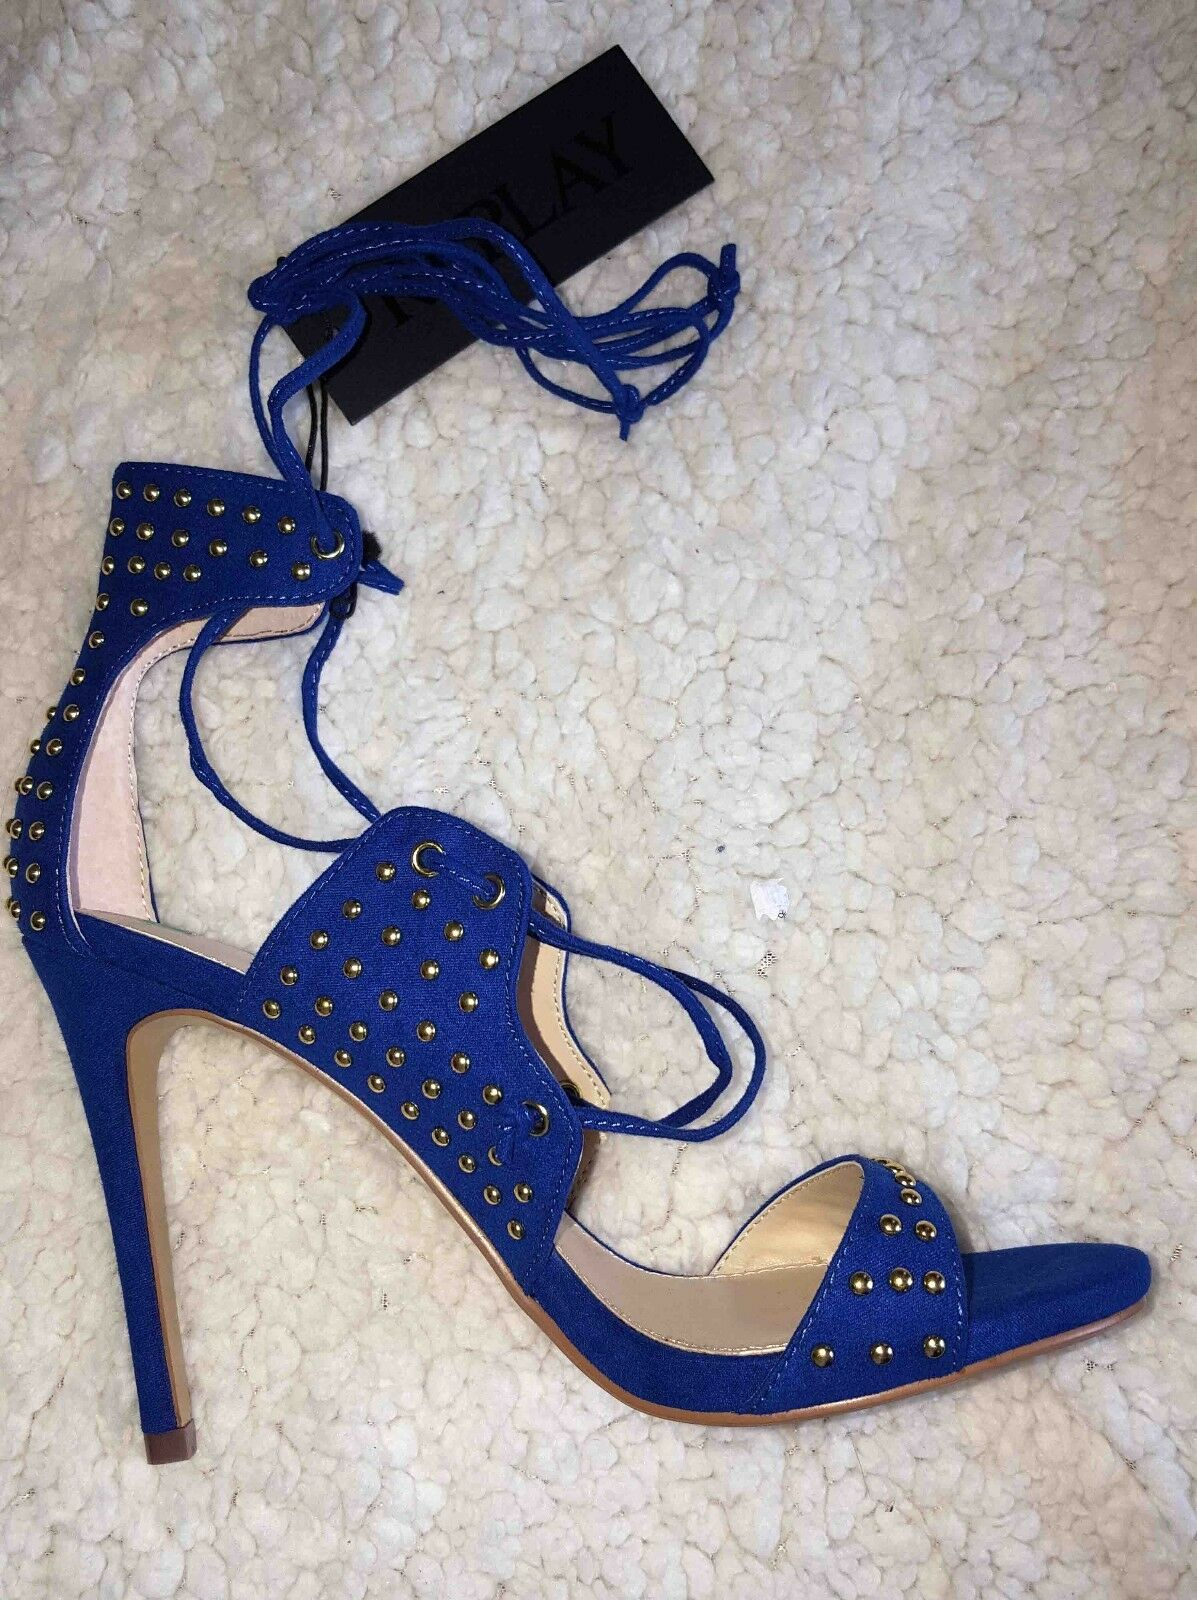 REPLAY SIZE Blau STILETTO HEEL Schuhe SIZE REPLAY UK4 EU37 aa583d